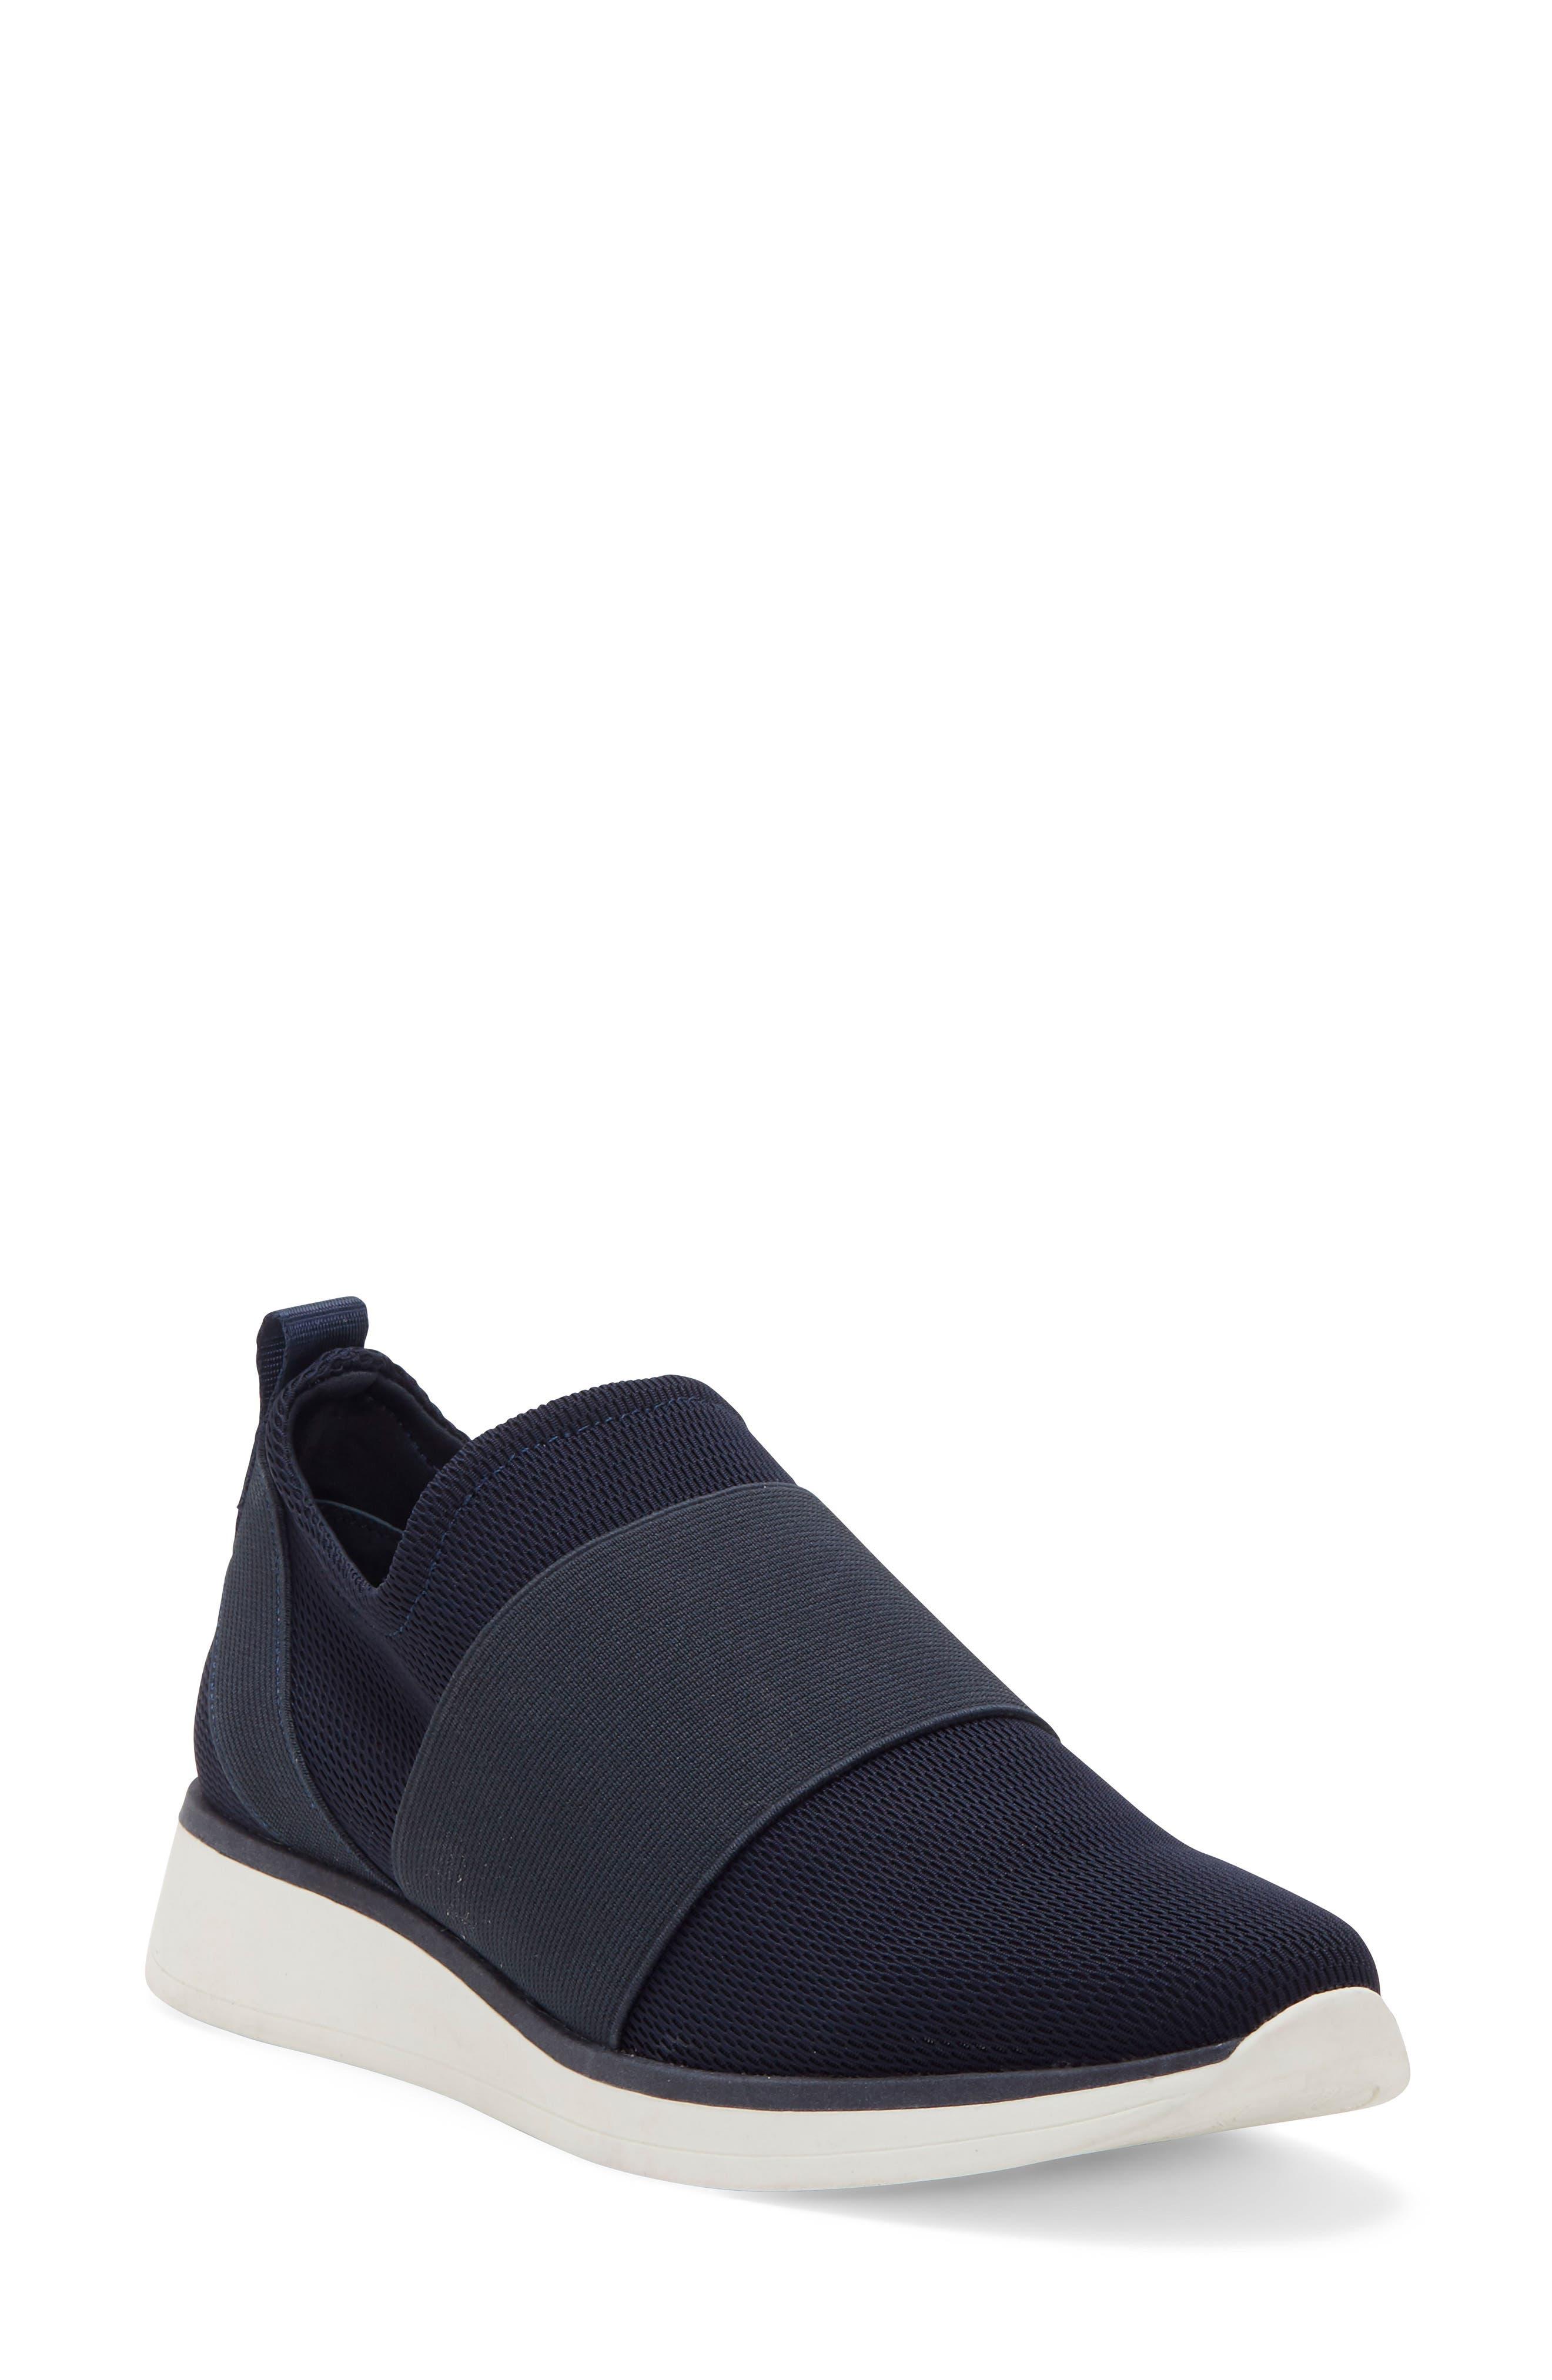 Louise Et Cie Braxton Sneaker- Blue